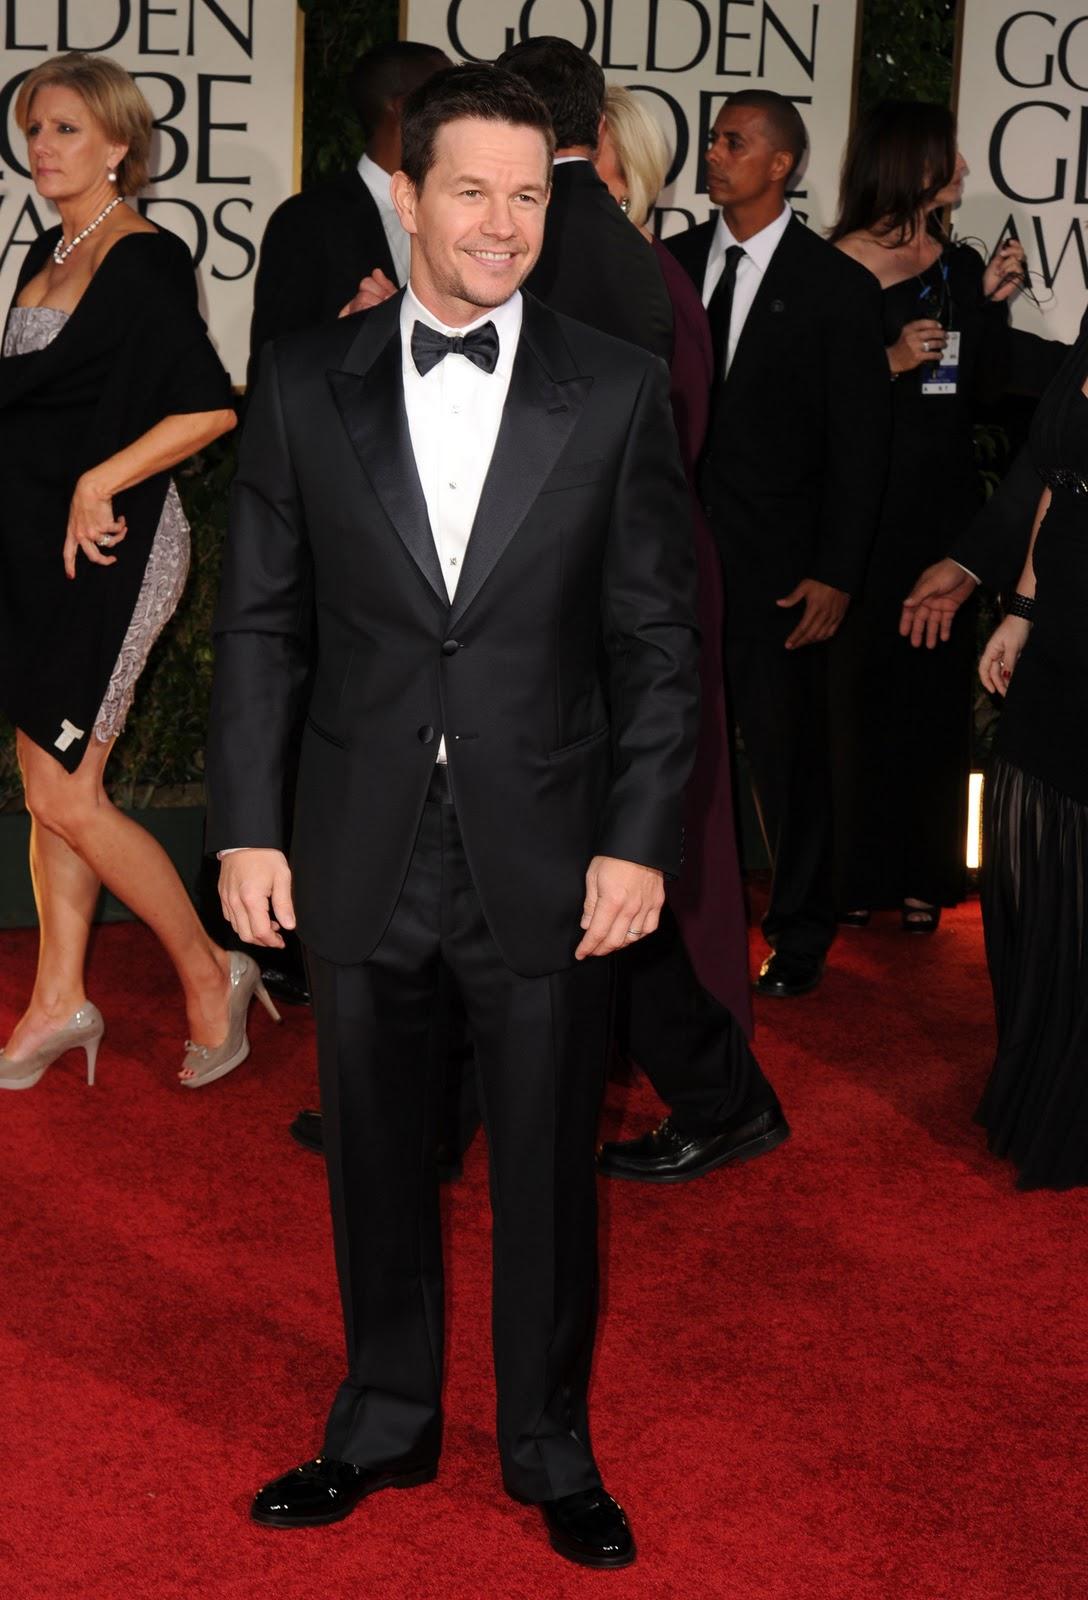 http://2.bp.blogspot.com/-fpvpWEvuAbA/TxR2sWh4IUI/AAAAAAAAKlI/JAPGvaqGaGA/s1600/Mark+Wahlberg.jpg